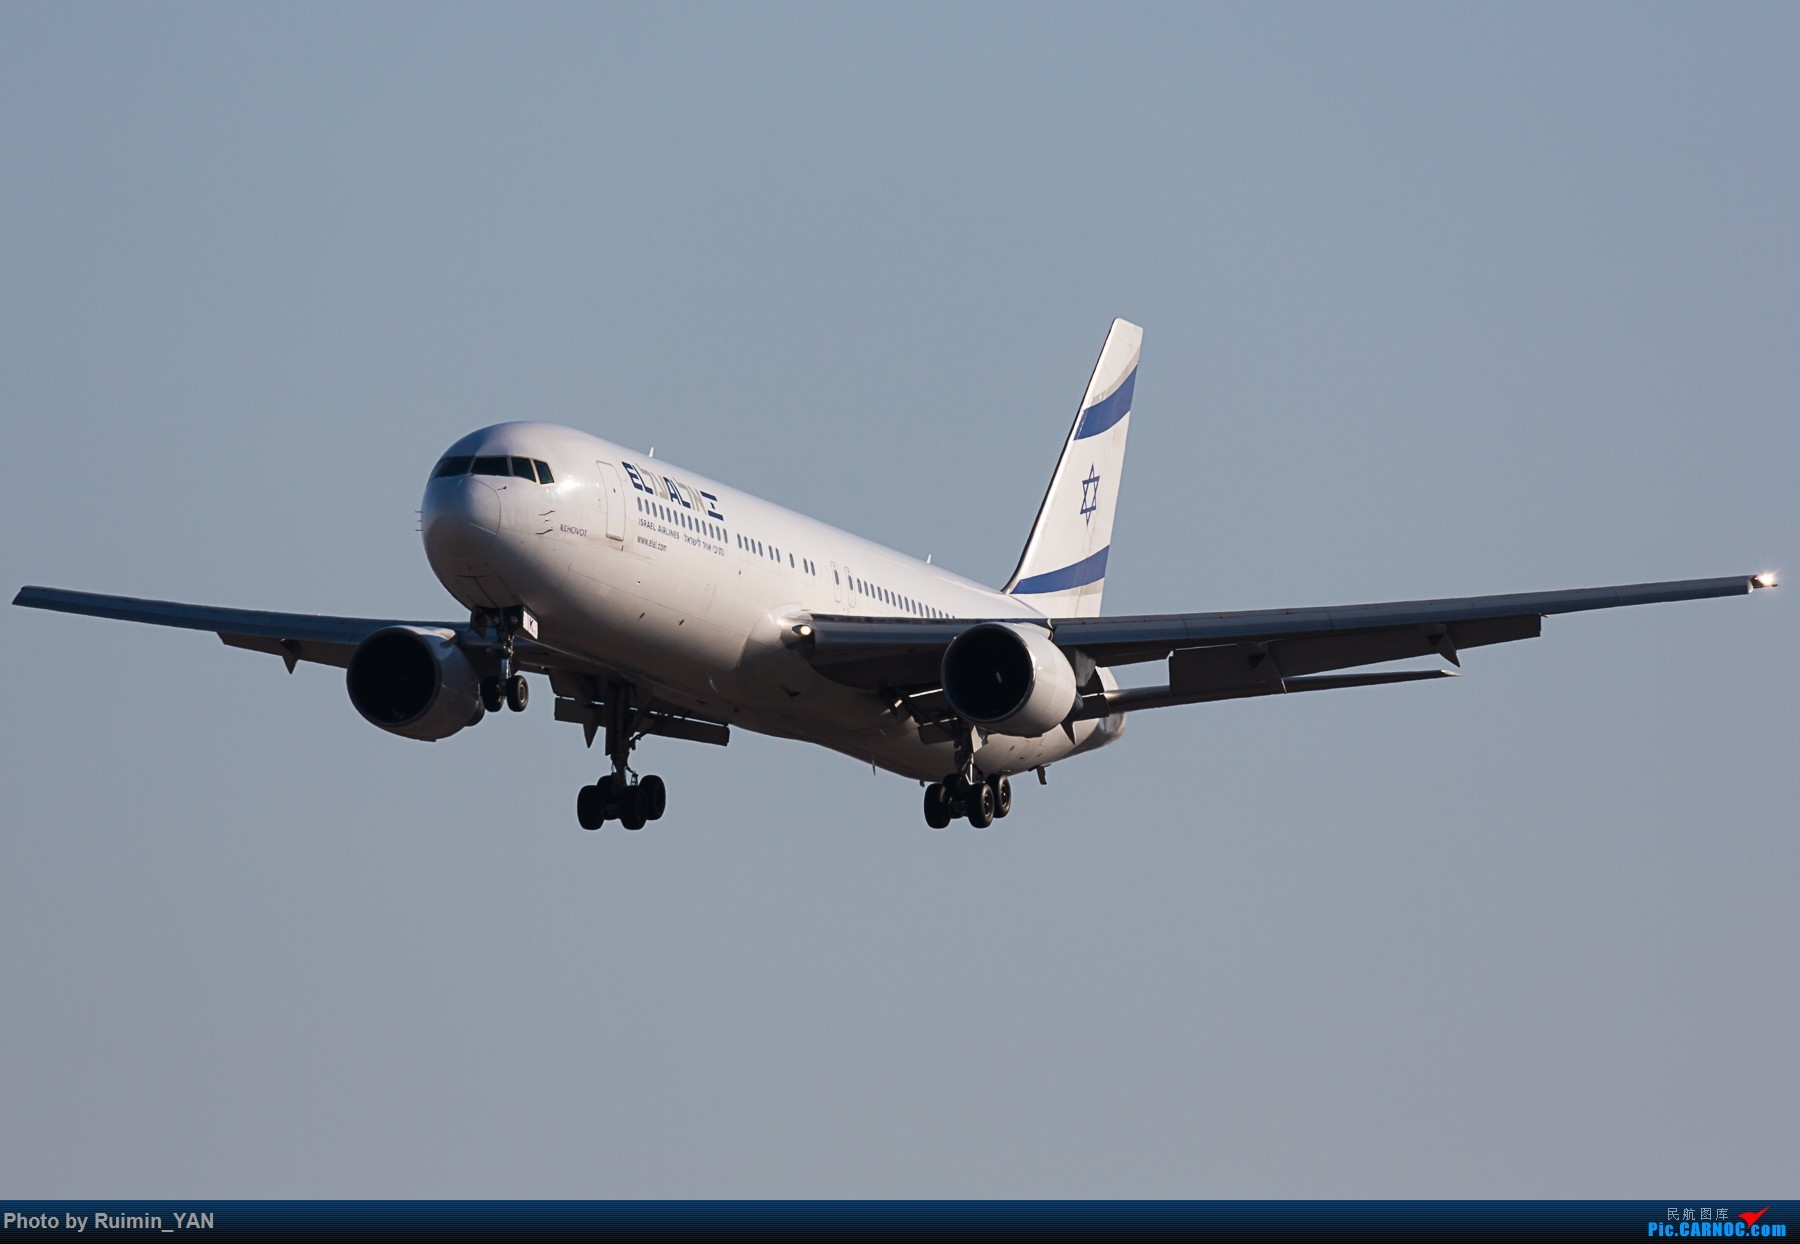 [原创]【PEK】以色列航空 老涂装(LY,El Al Israel Airlines)763 4X-EAK BOEING 767-300ER 4X-EAK 中国北京首都国际机场